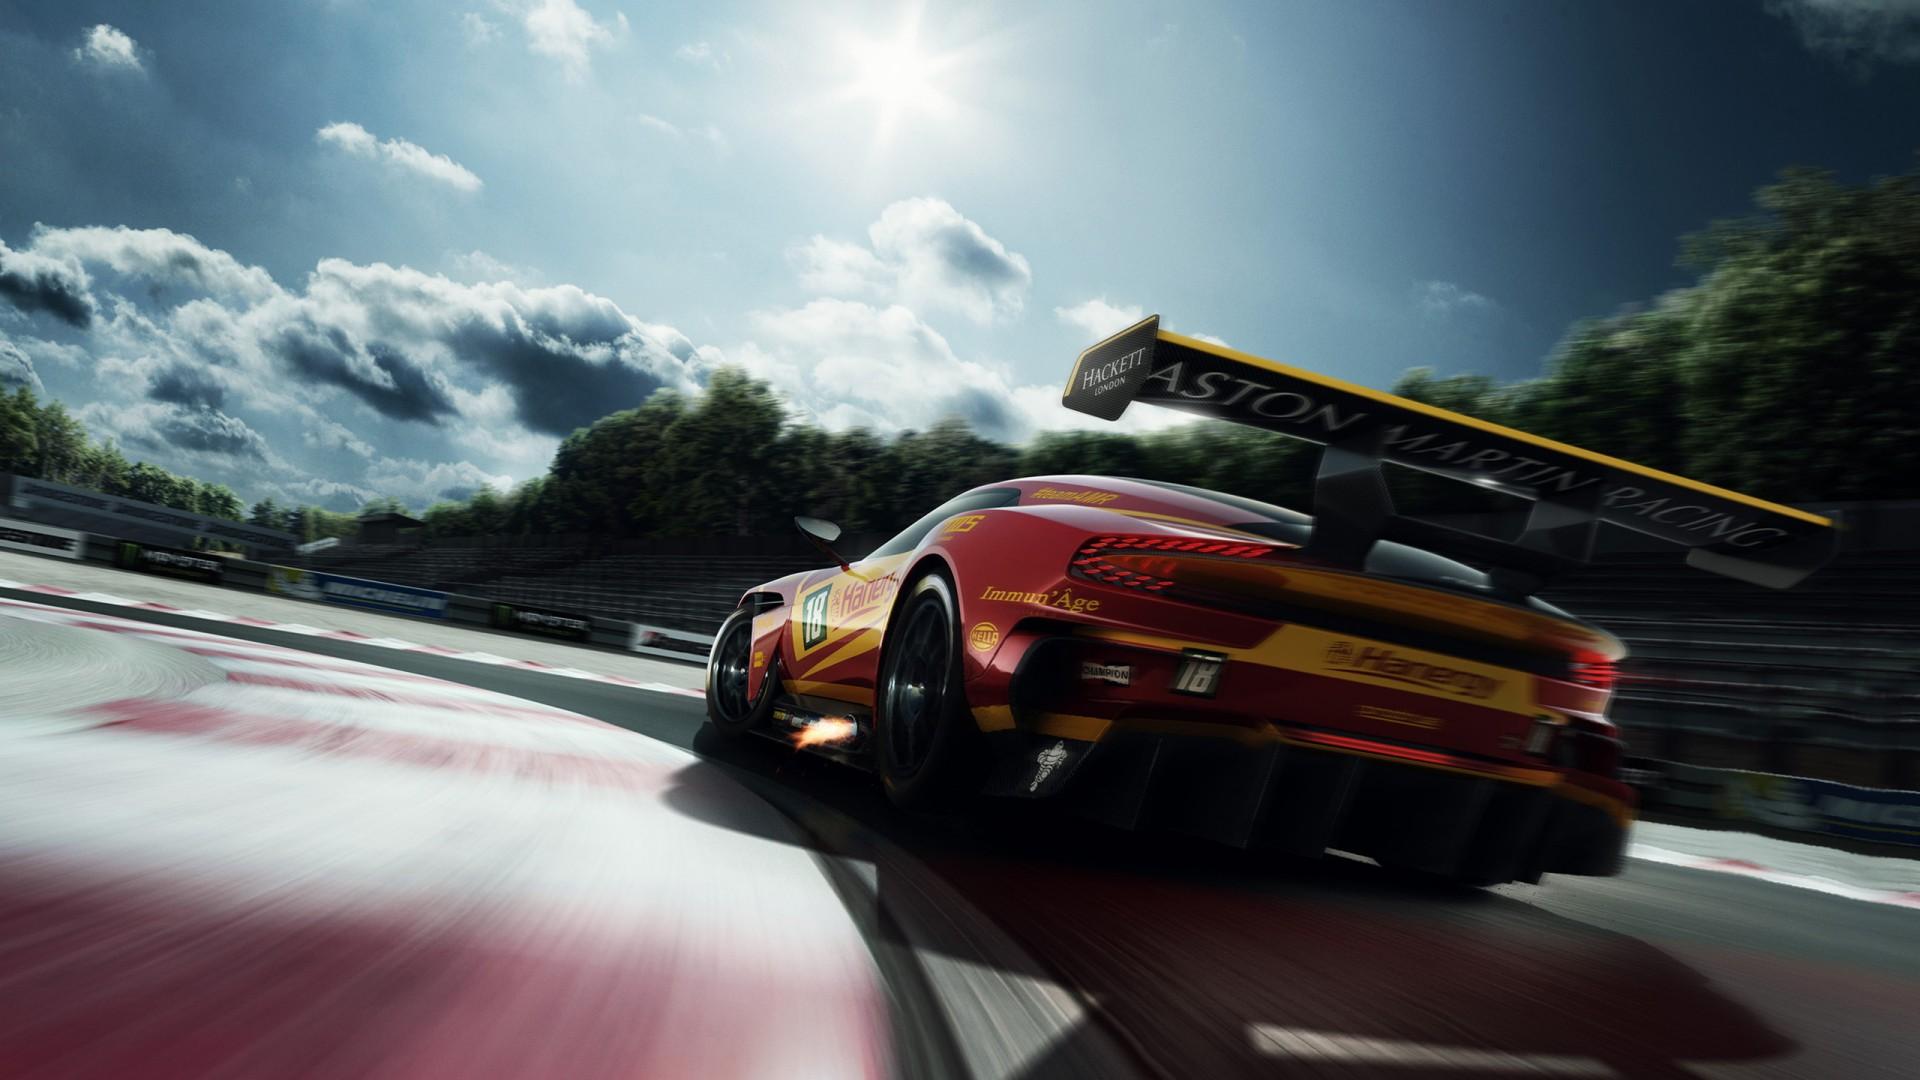 Aston Martin Vulcan Racing Hd X